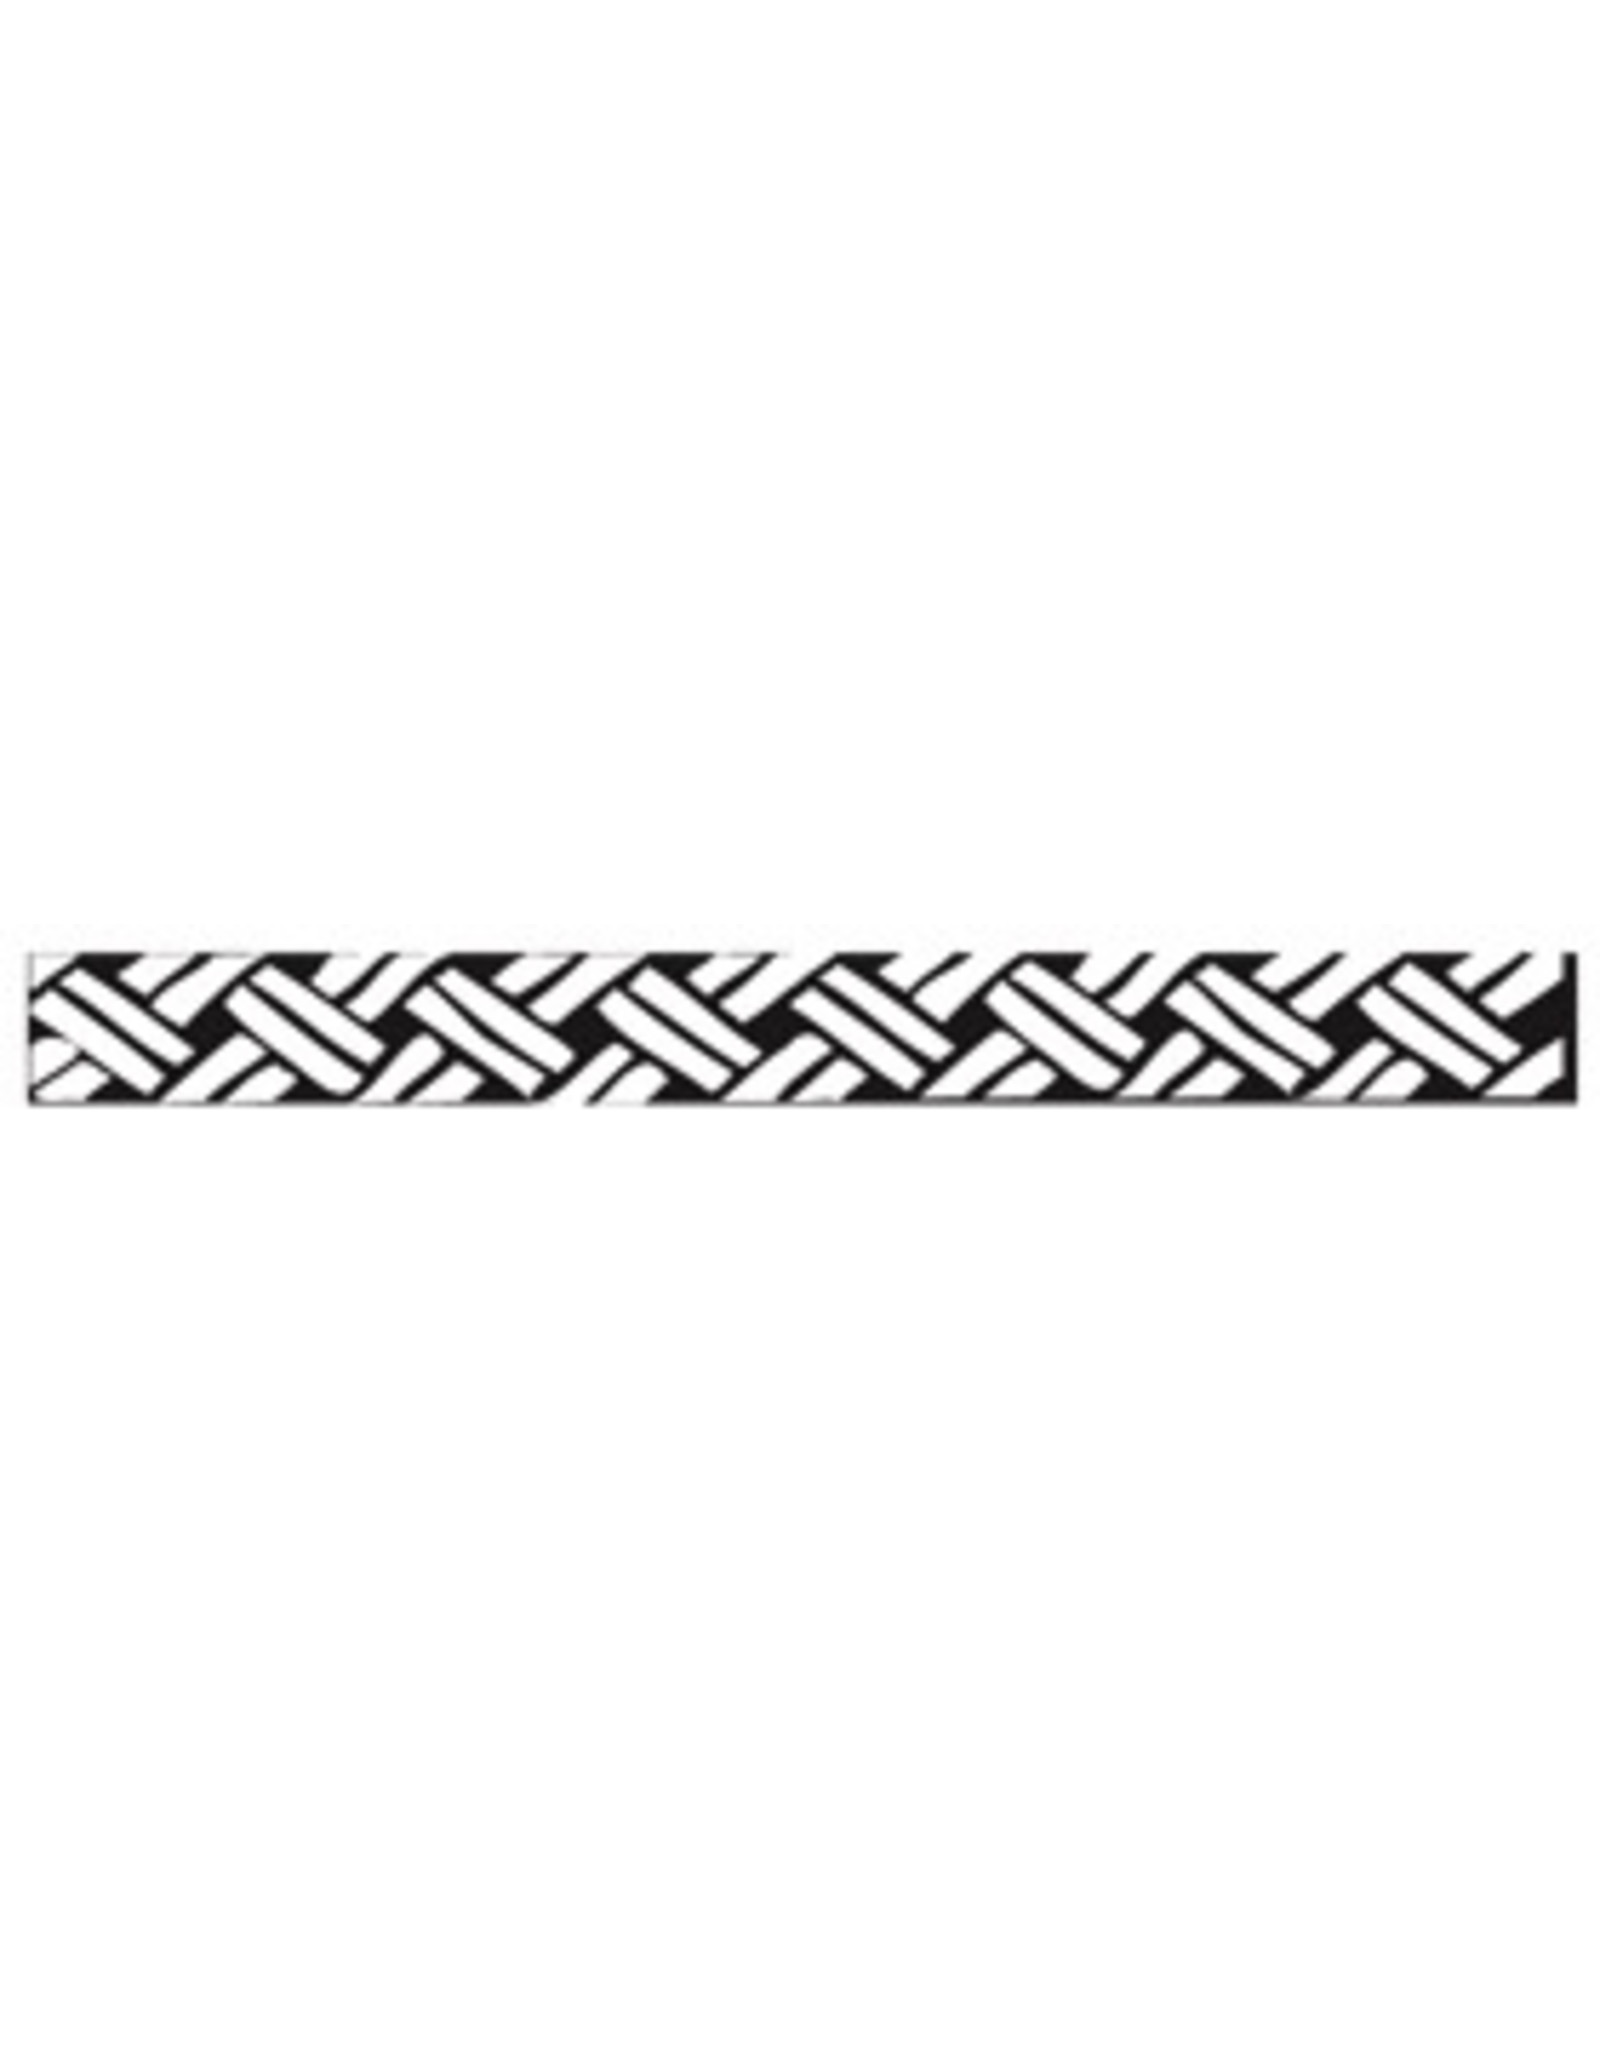 MKM tools Diagonal weave Pattern Roller